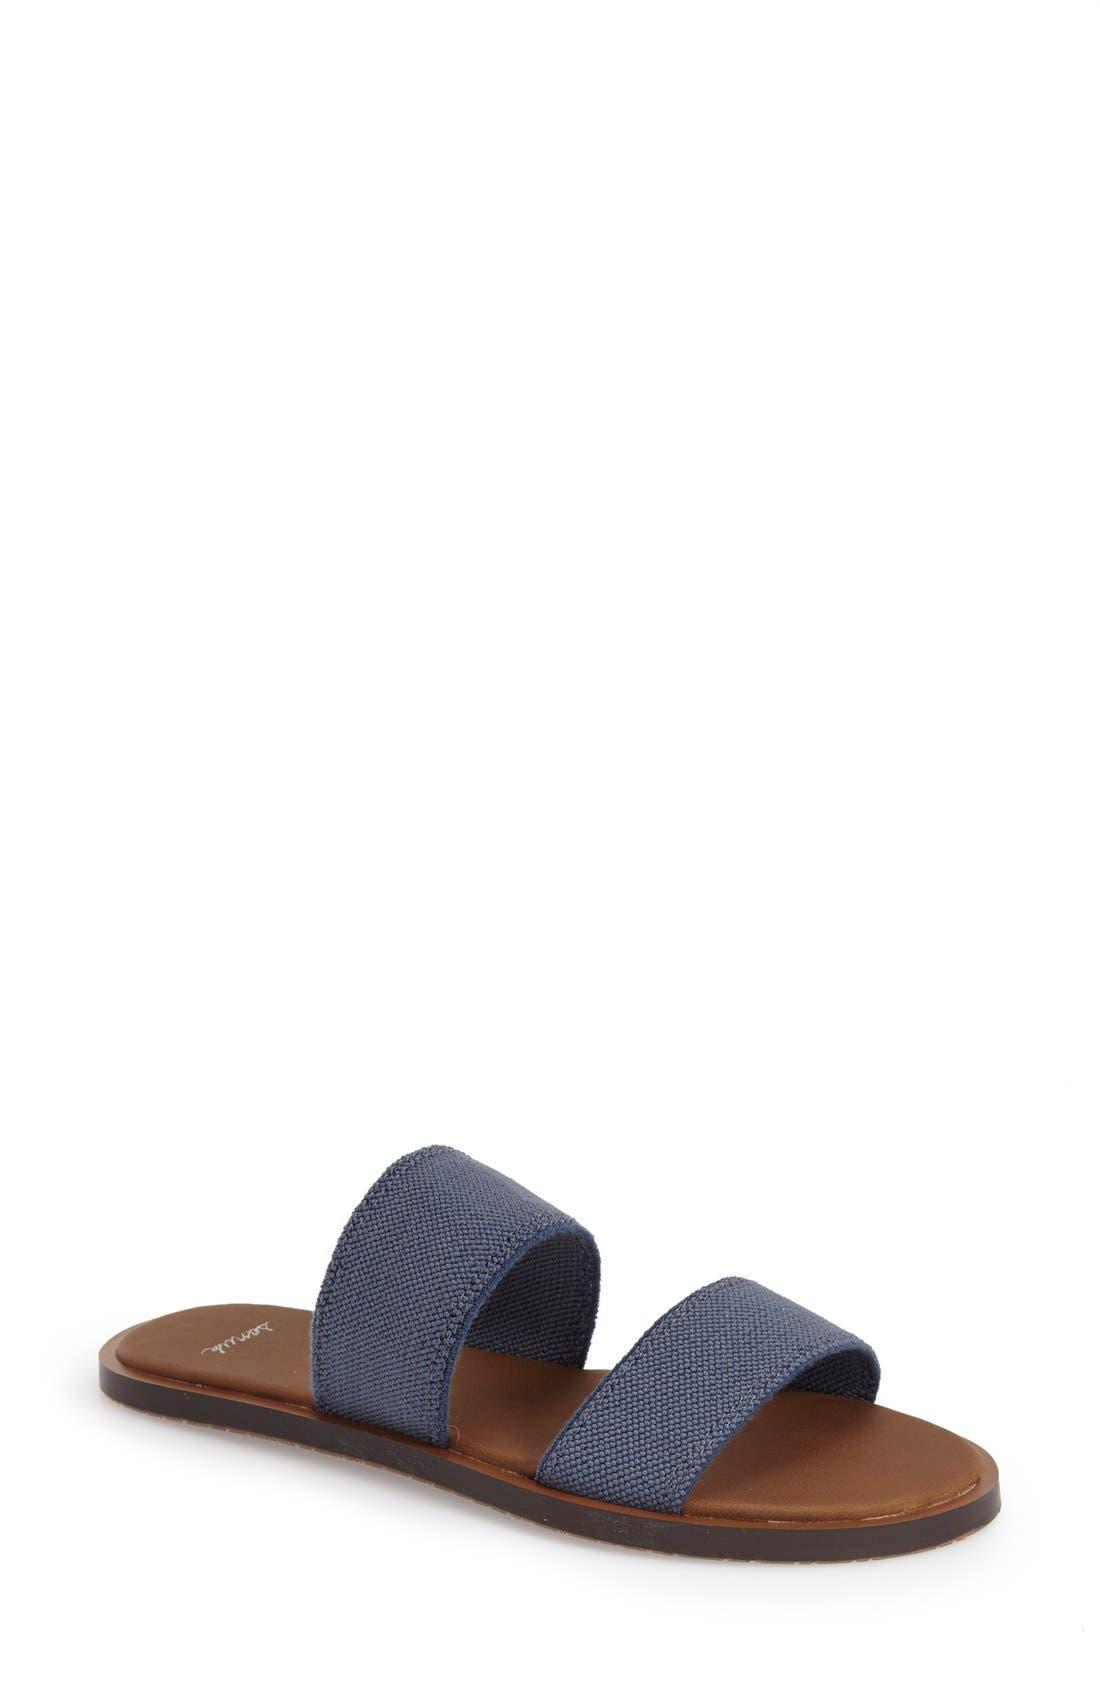 Main Image - Sanuk 'Yoga Gora Gora' Slide Sandal (Women)